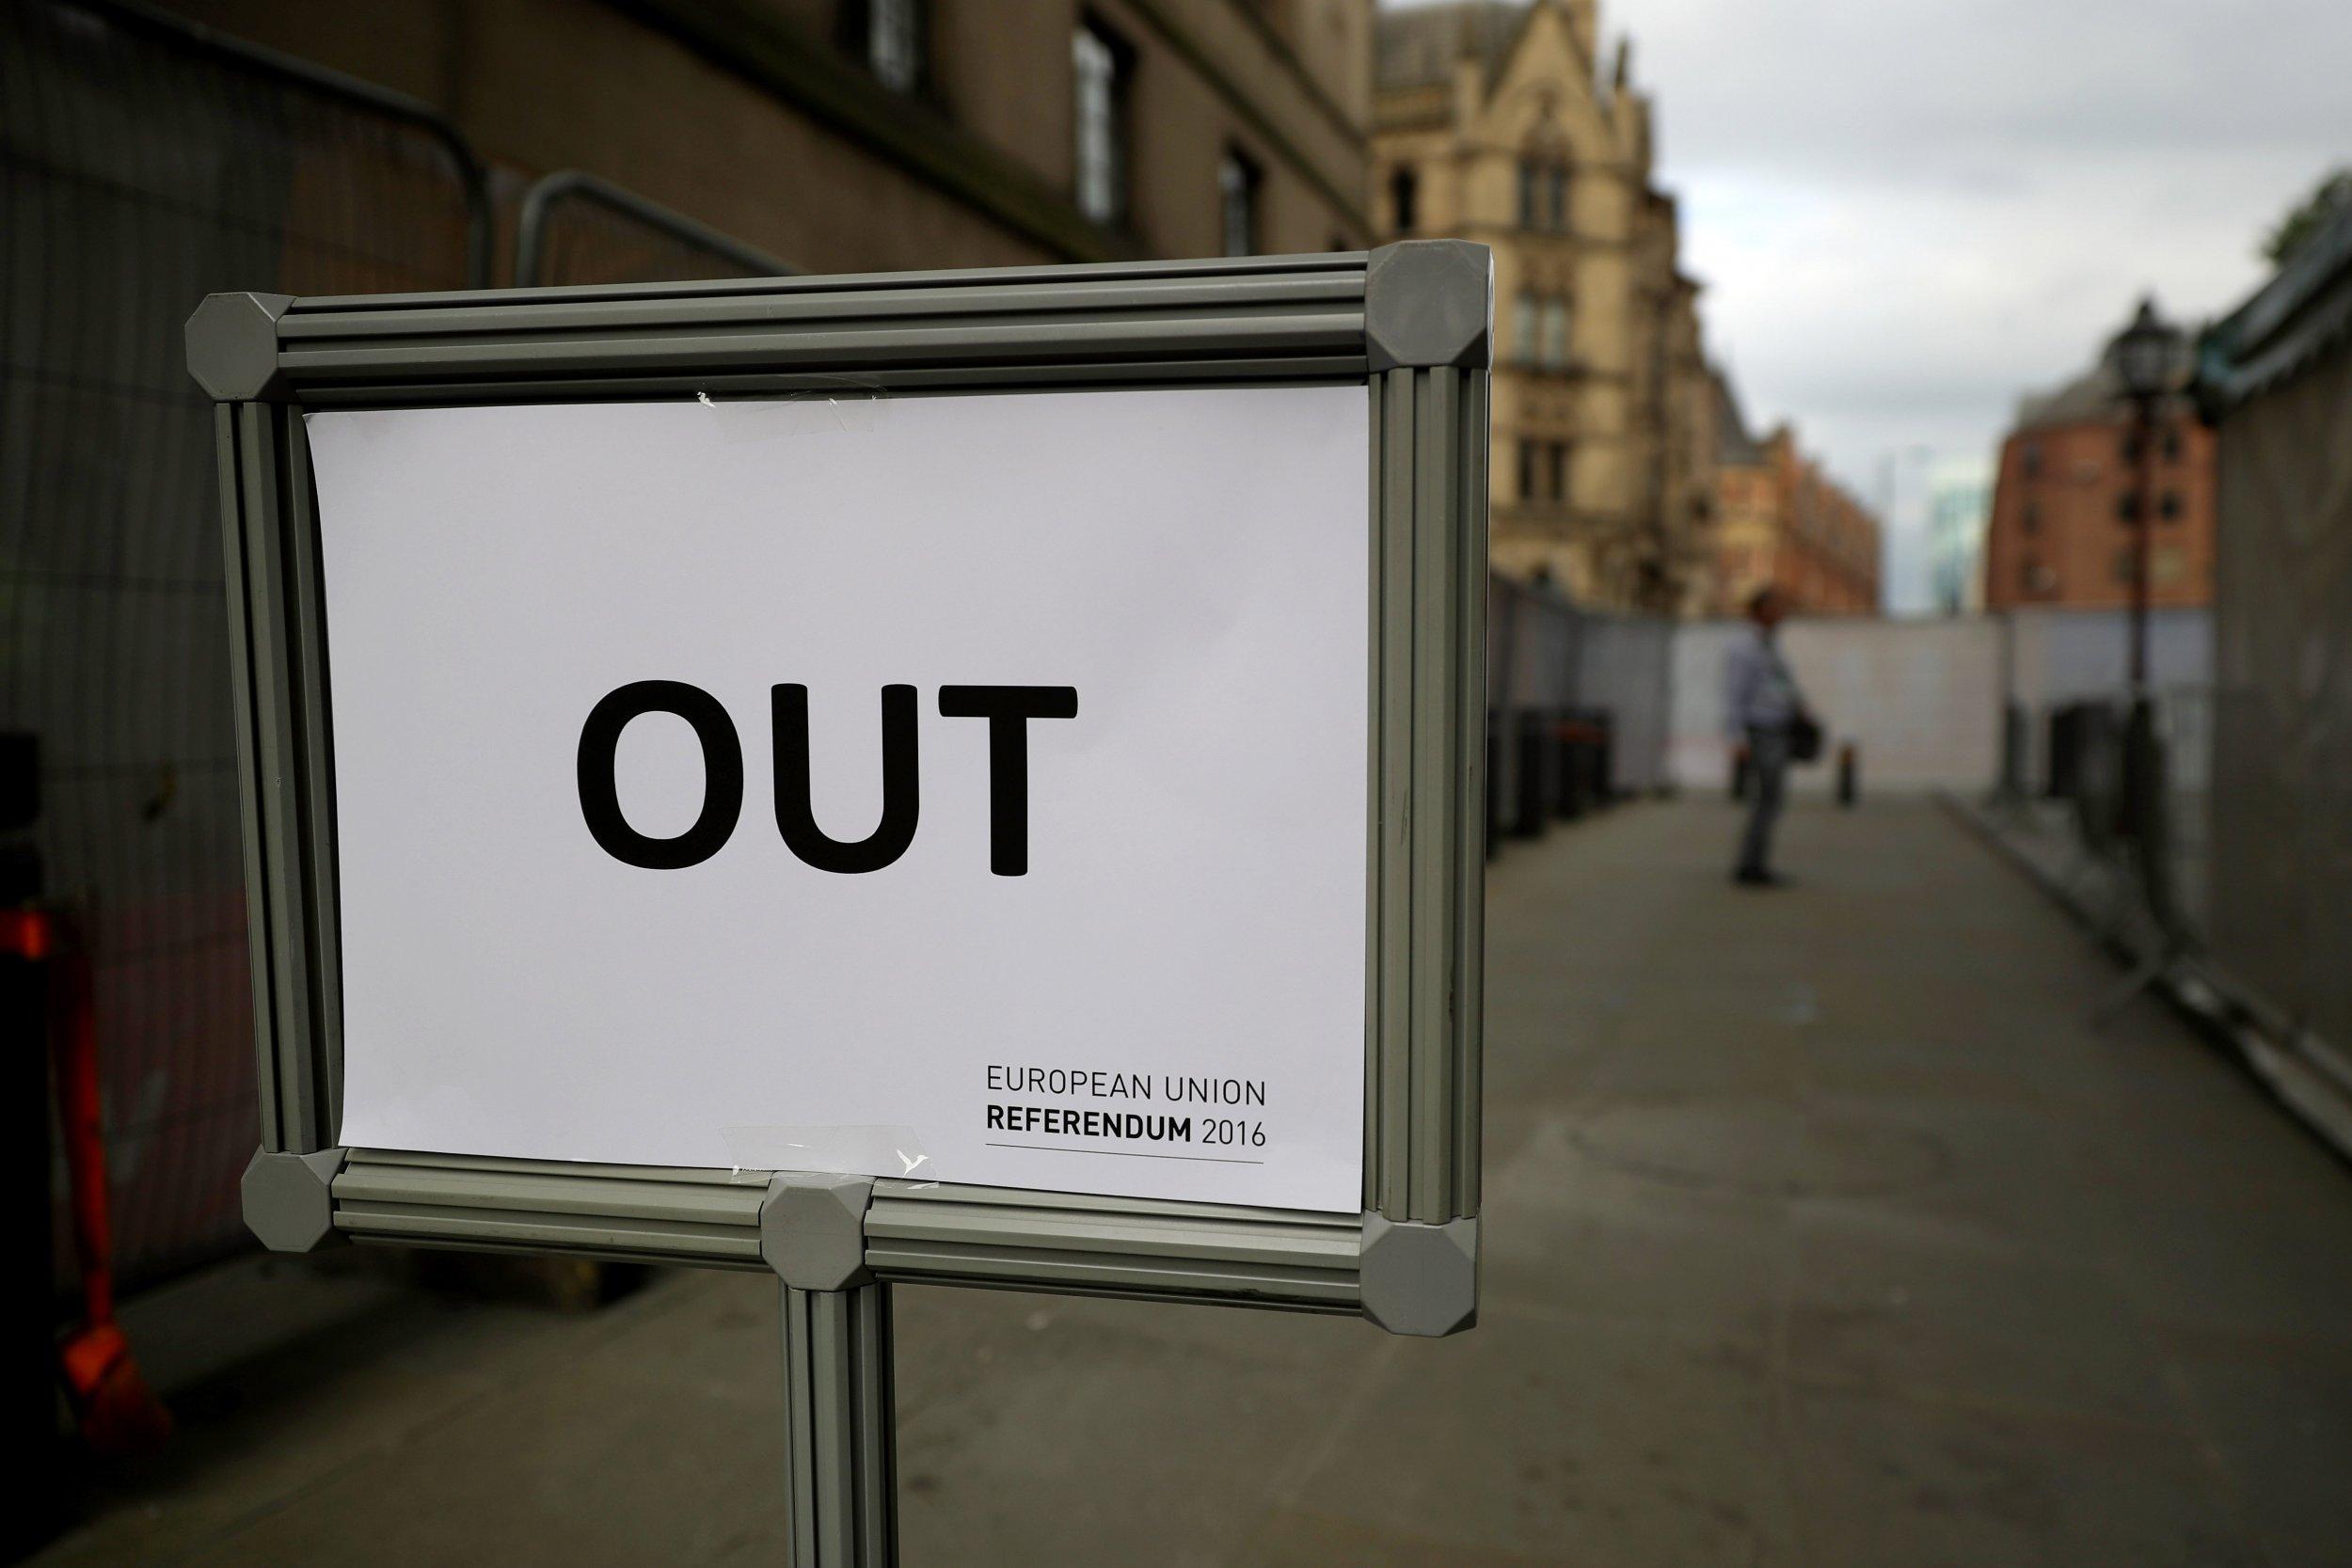 EU Referendum 'Out' exit sign